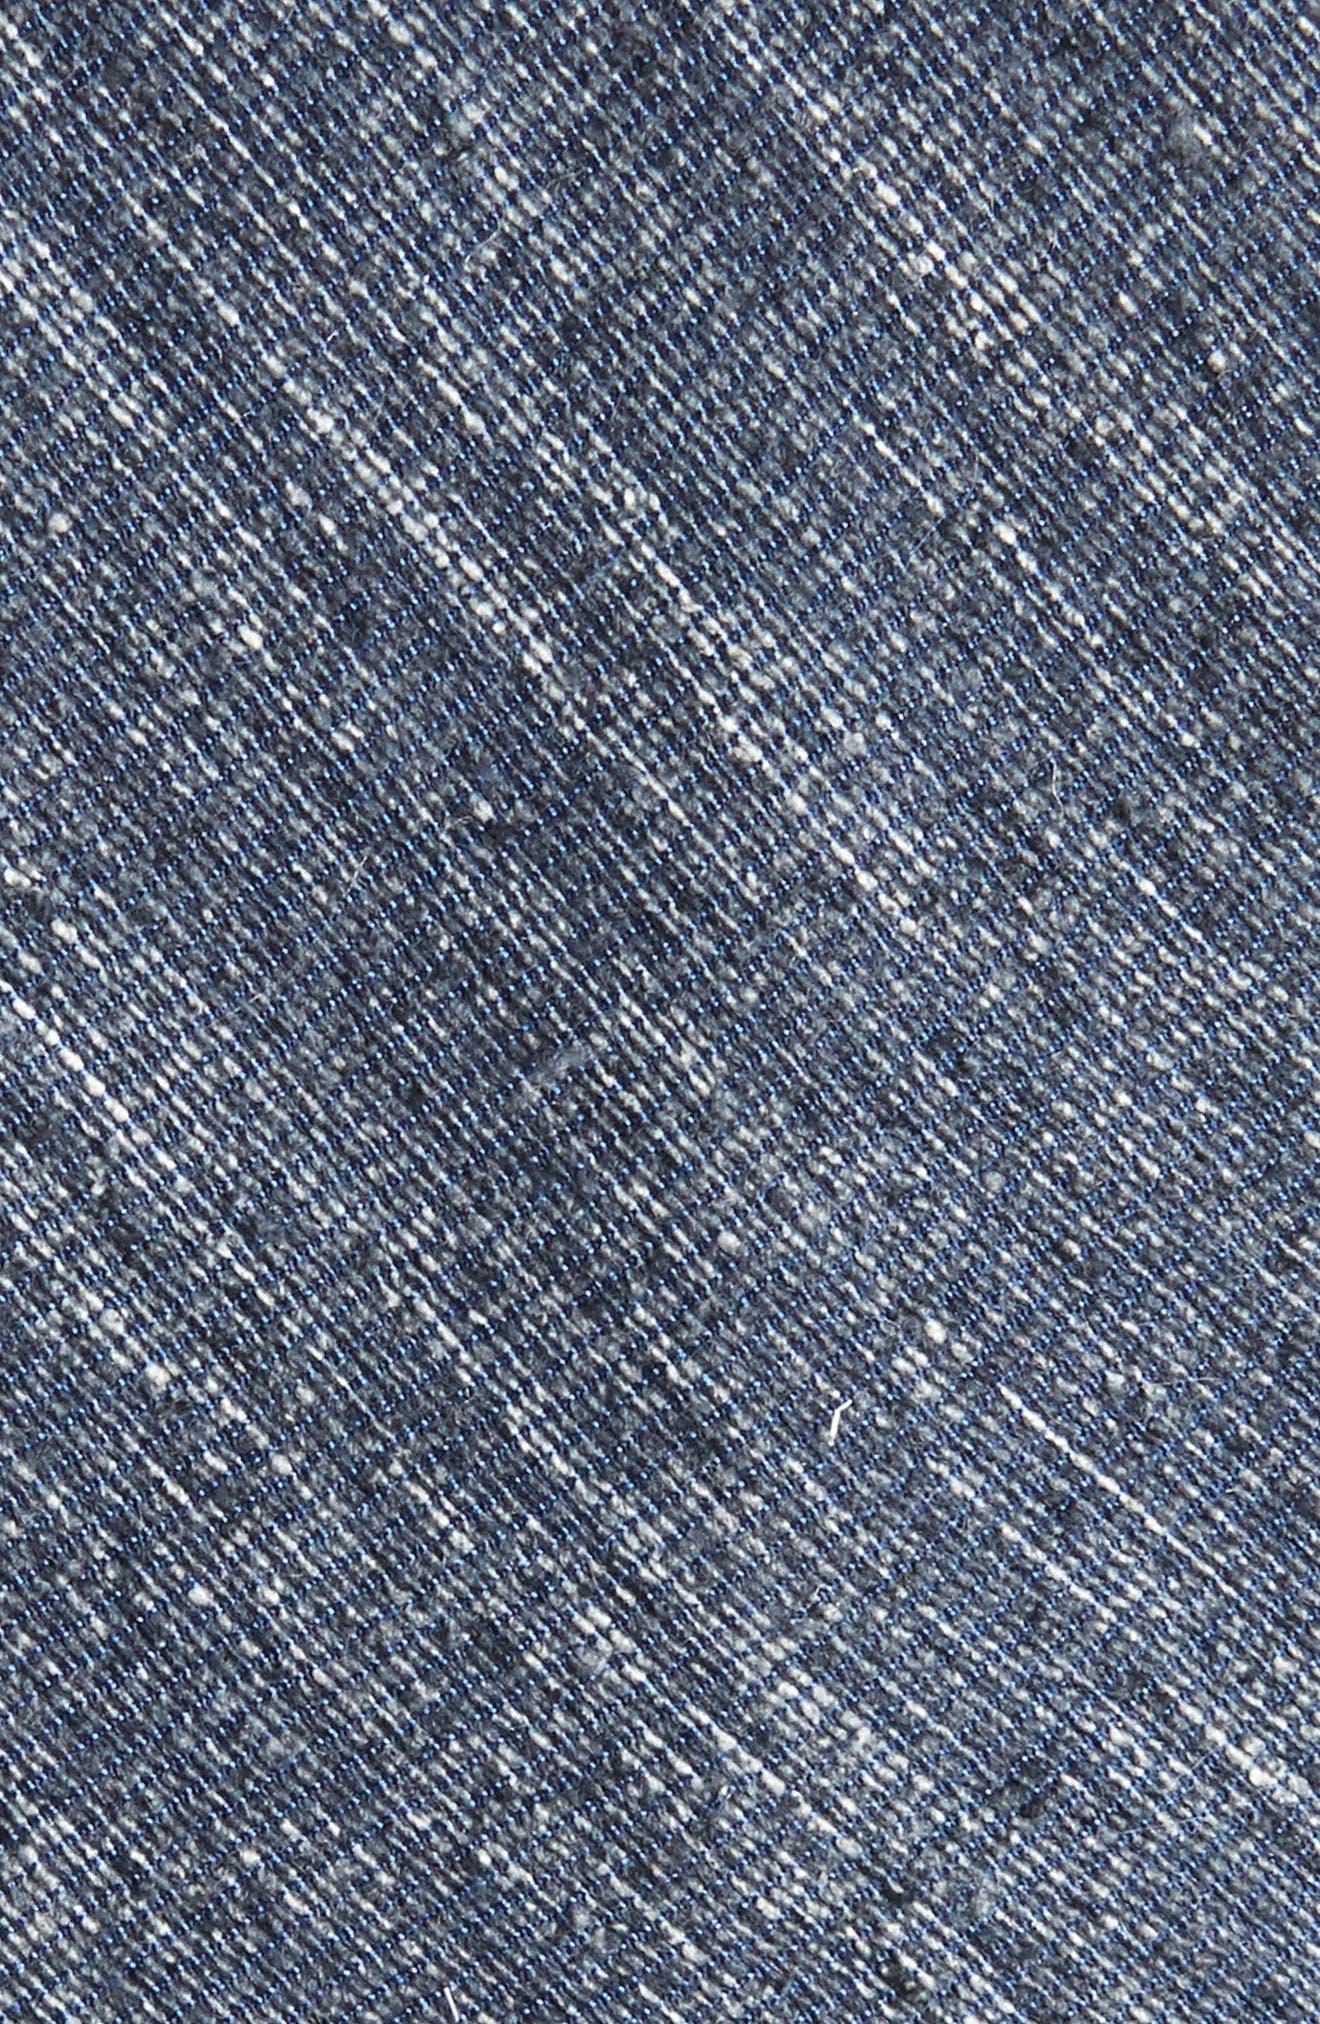 West Ridge Silk Skinny Tie,                             Alternate thumbnail 2, color,                             Navy